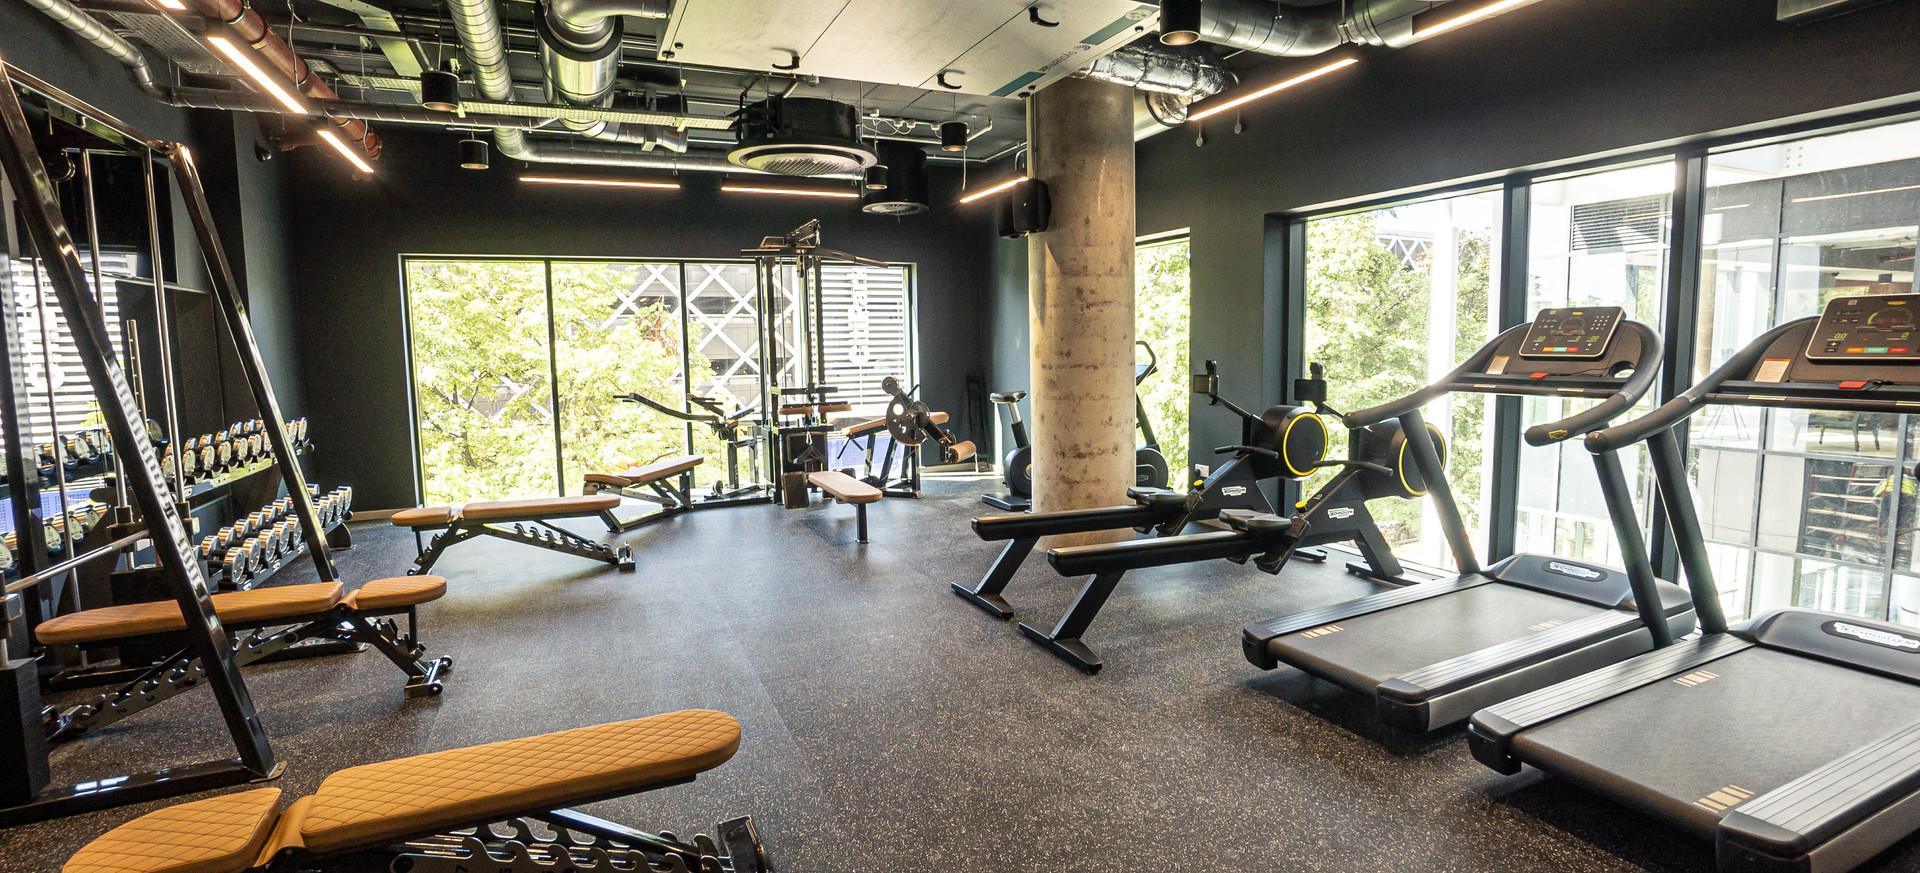 Liftd - Gym Design